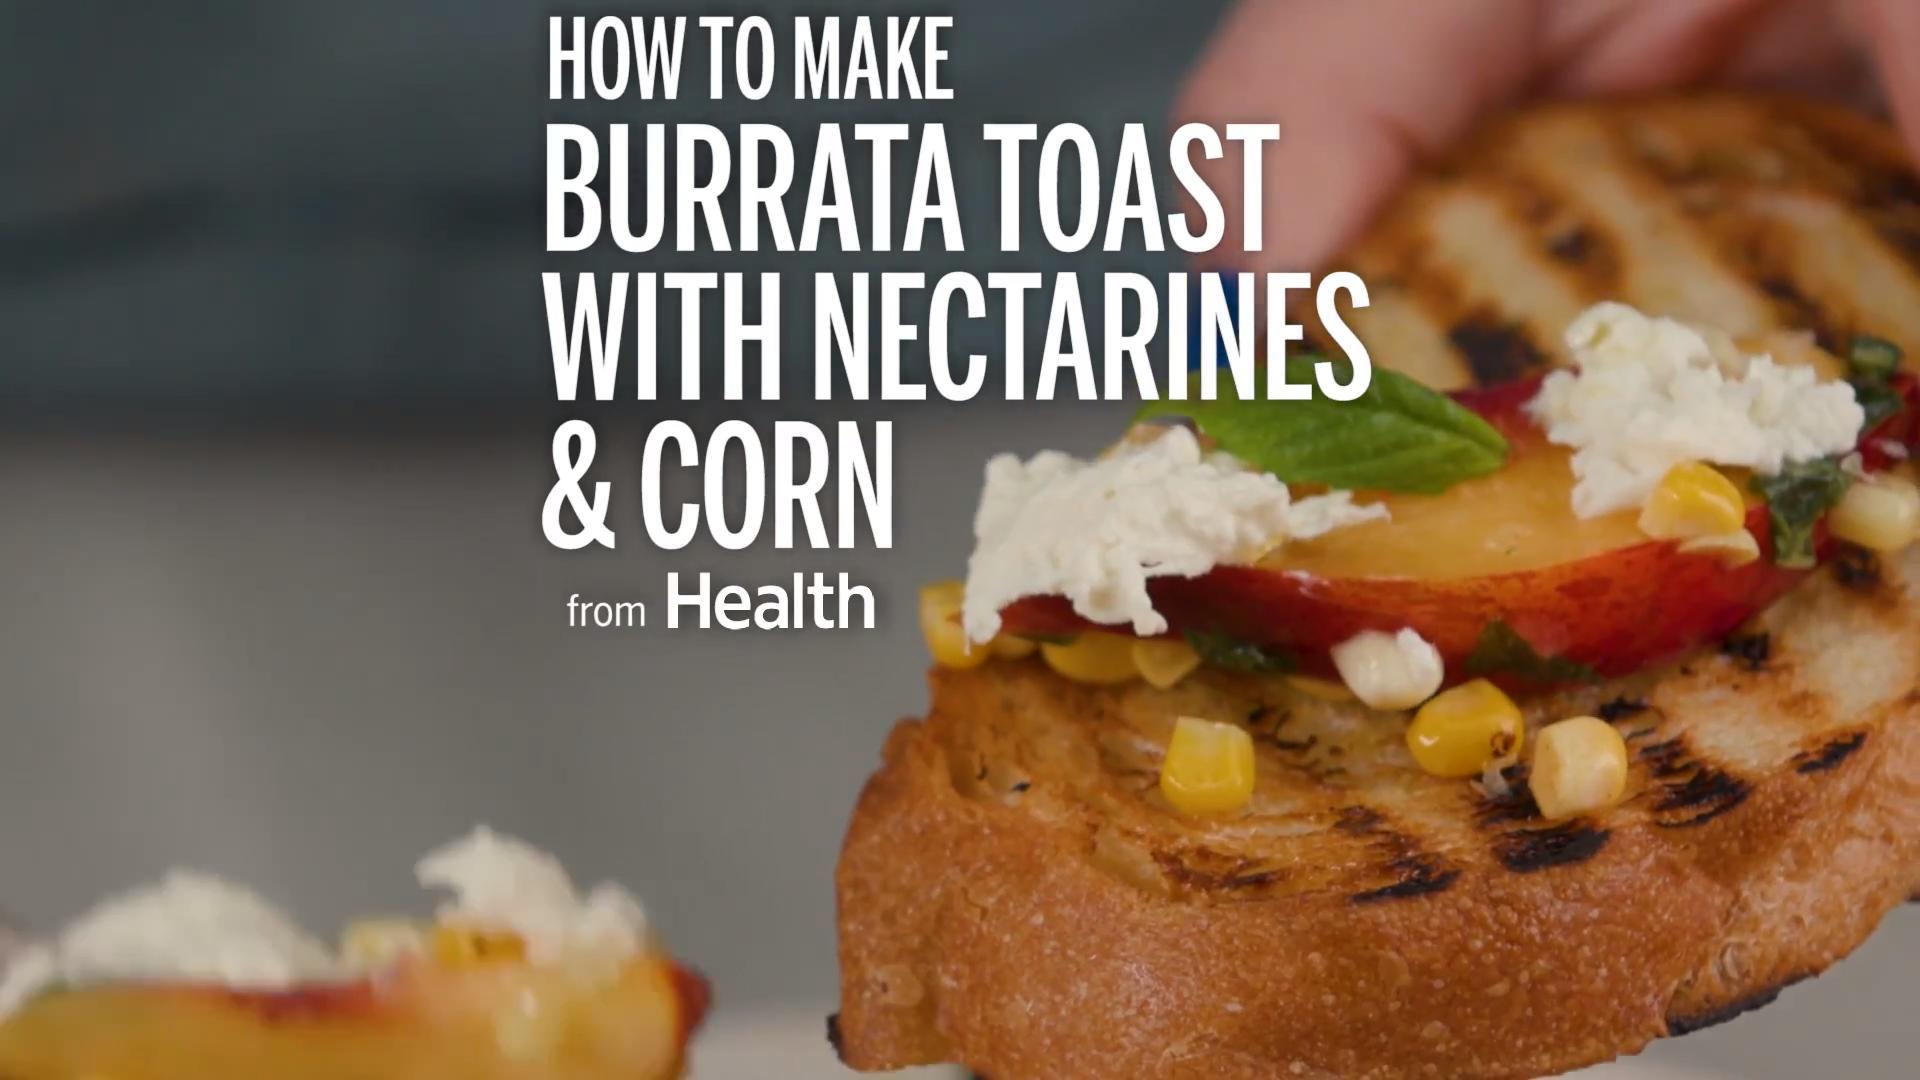 Burrata With Nectarines and Corn